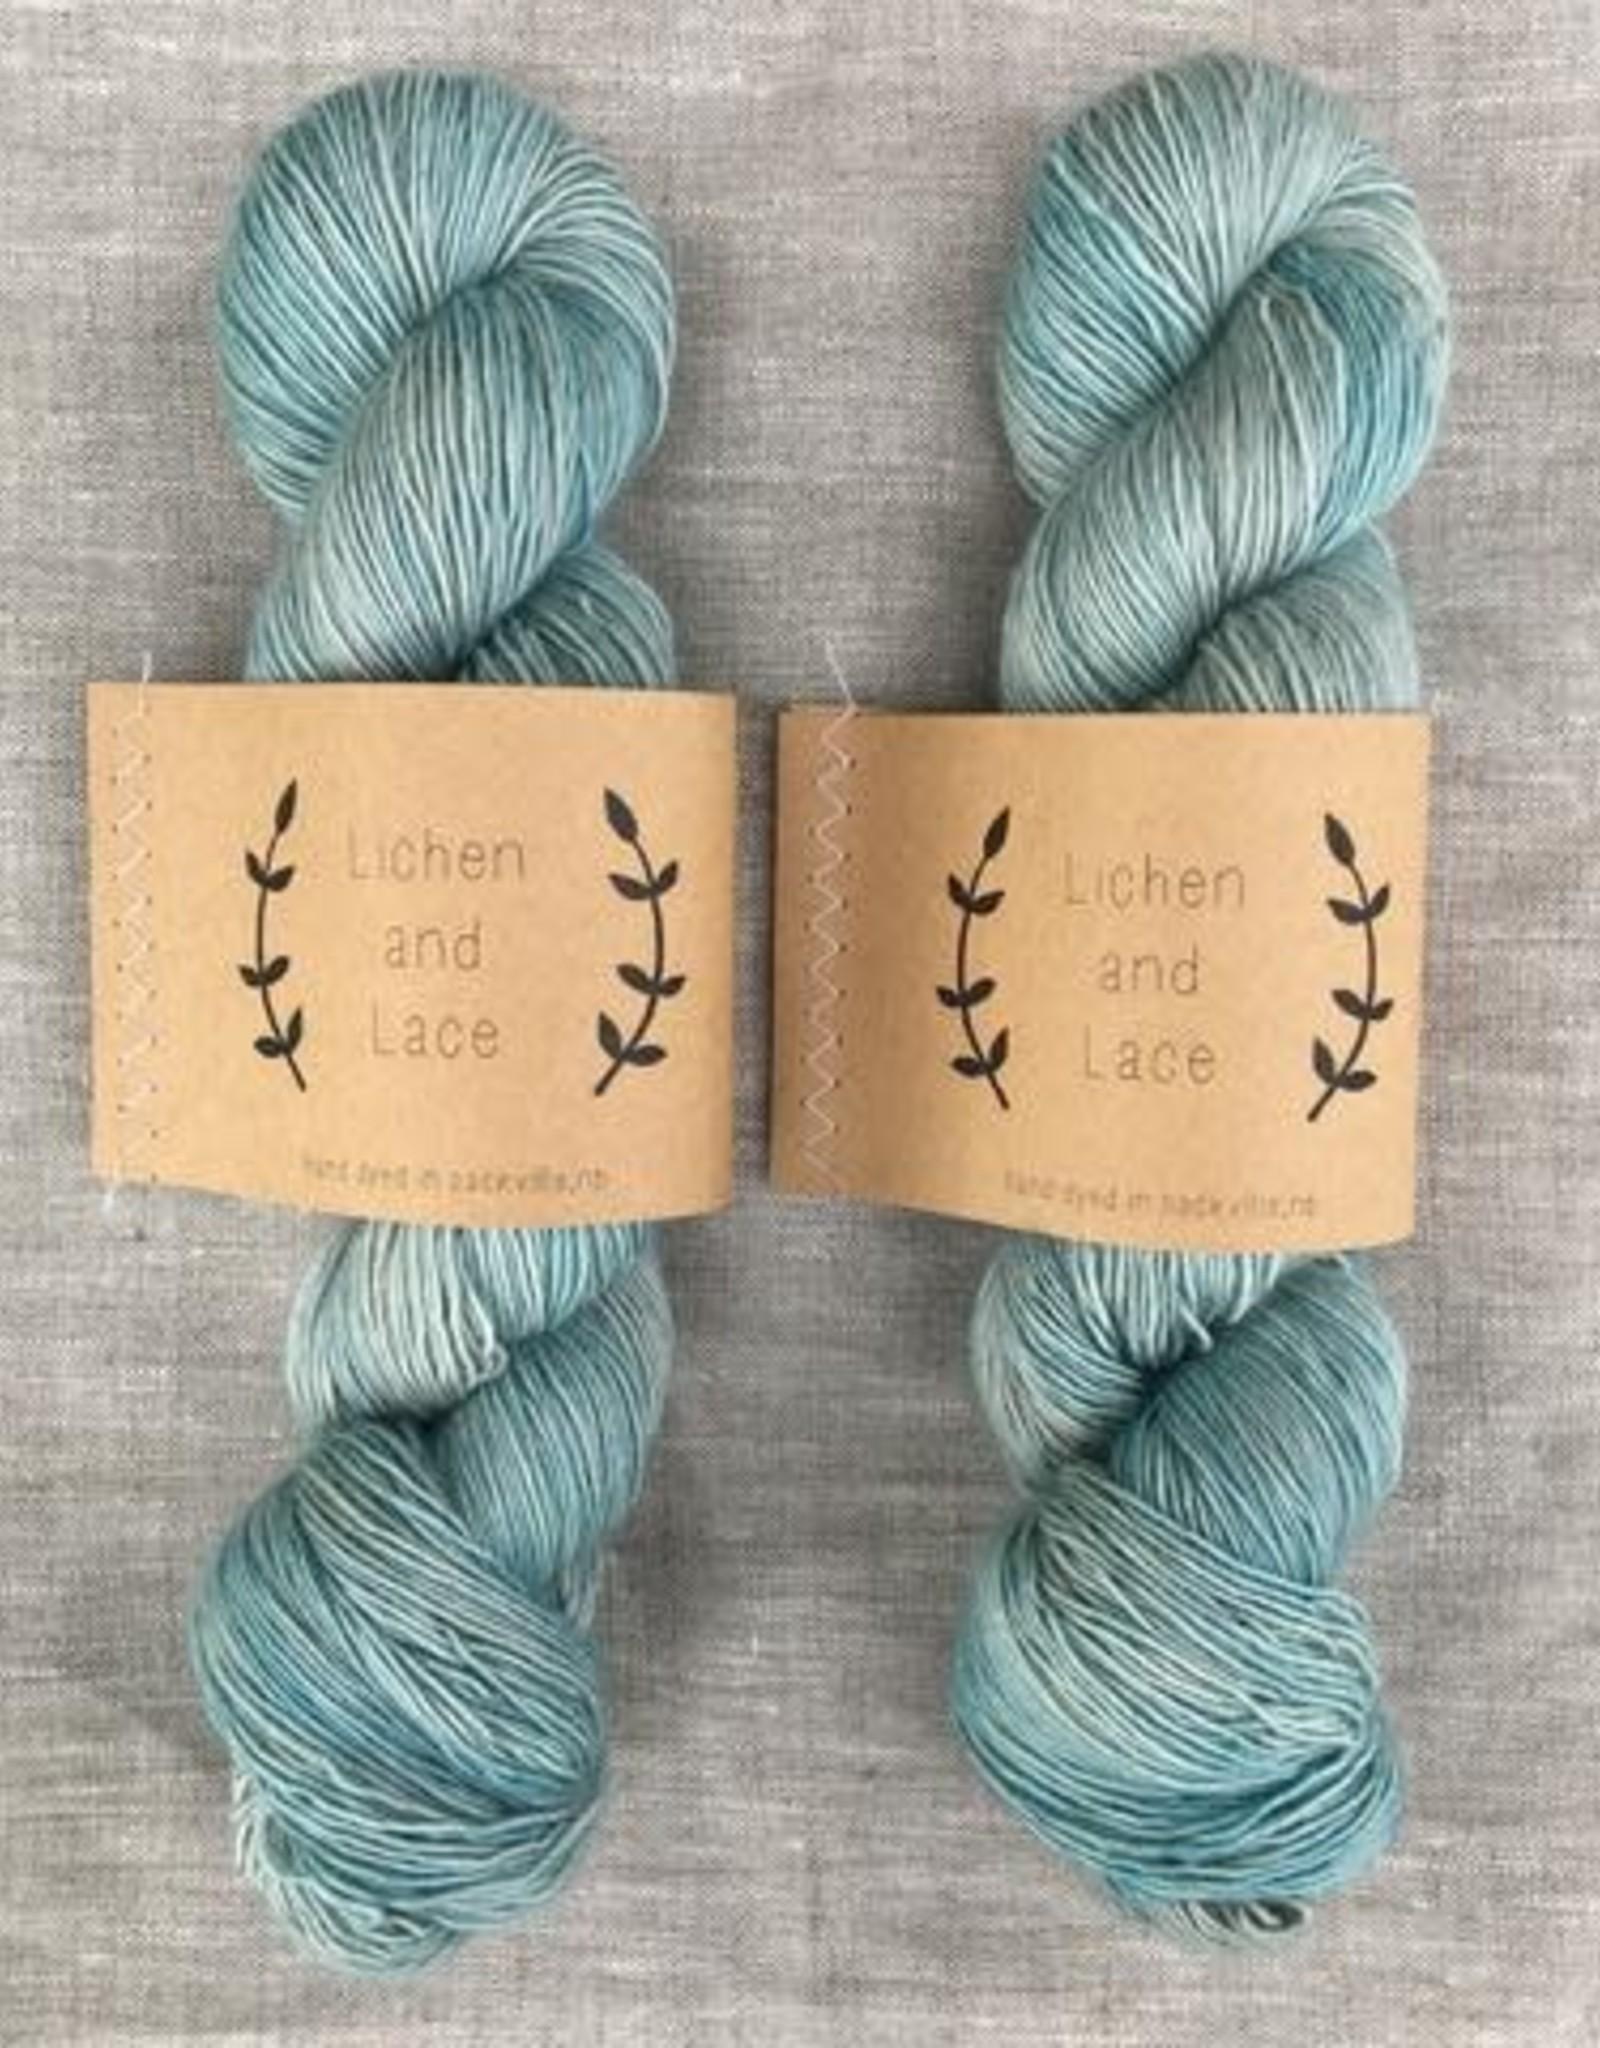 Lichen & Lace Lichen & Lace Matte Sock